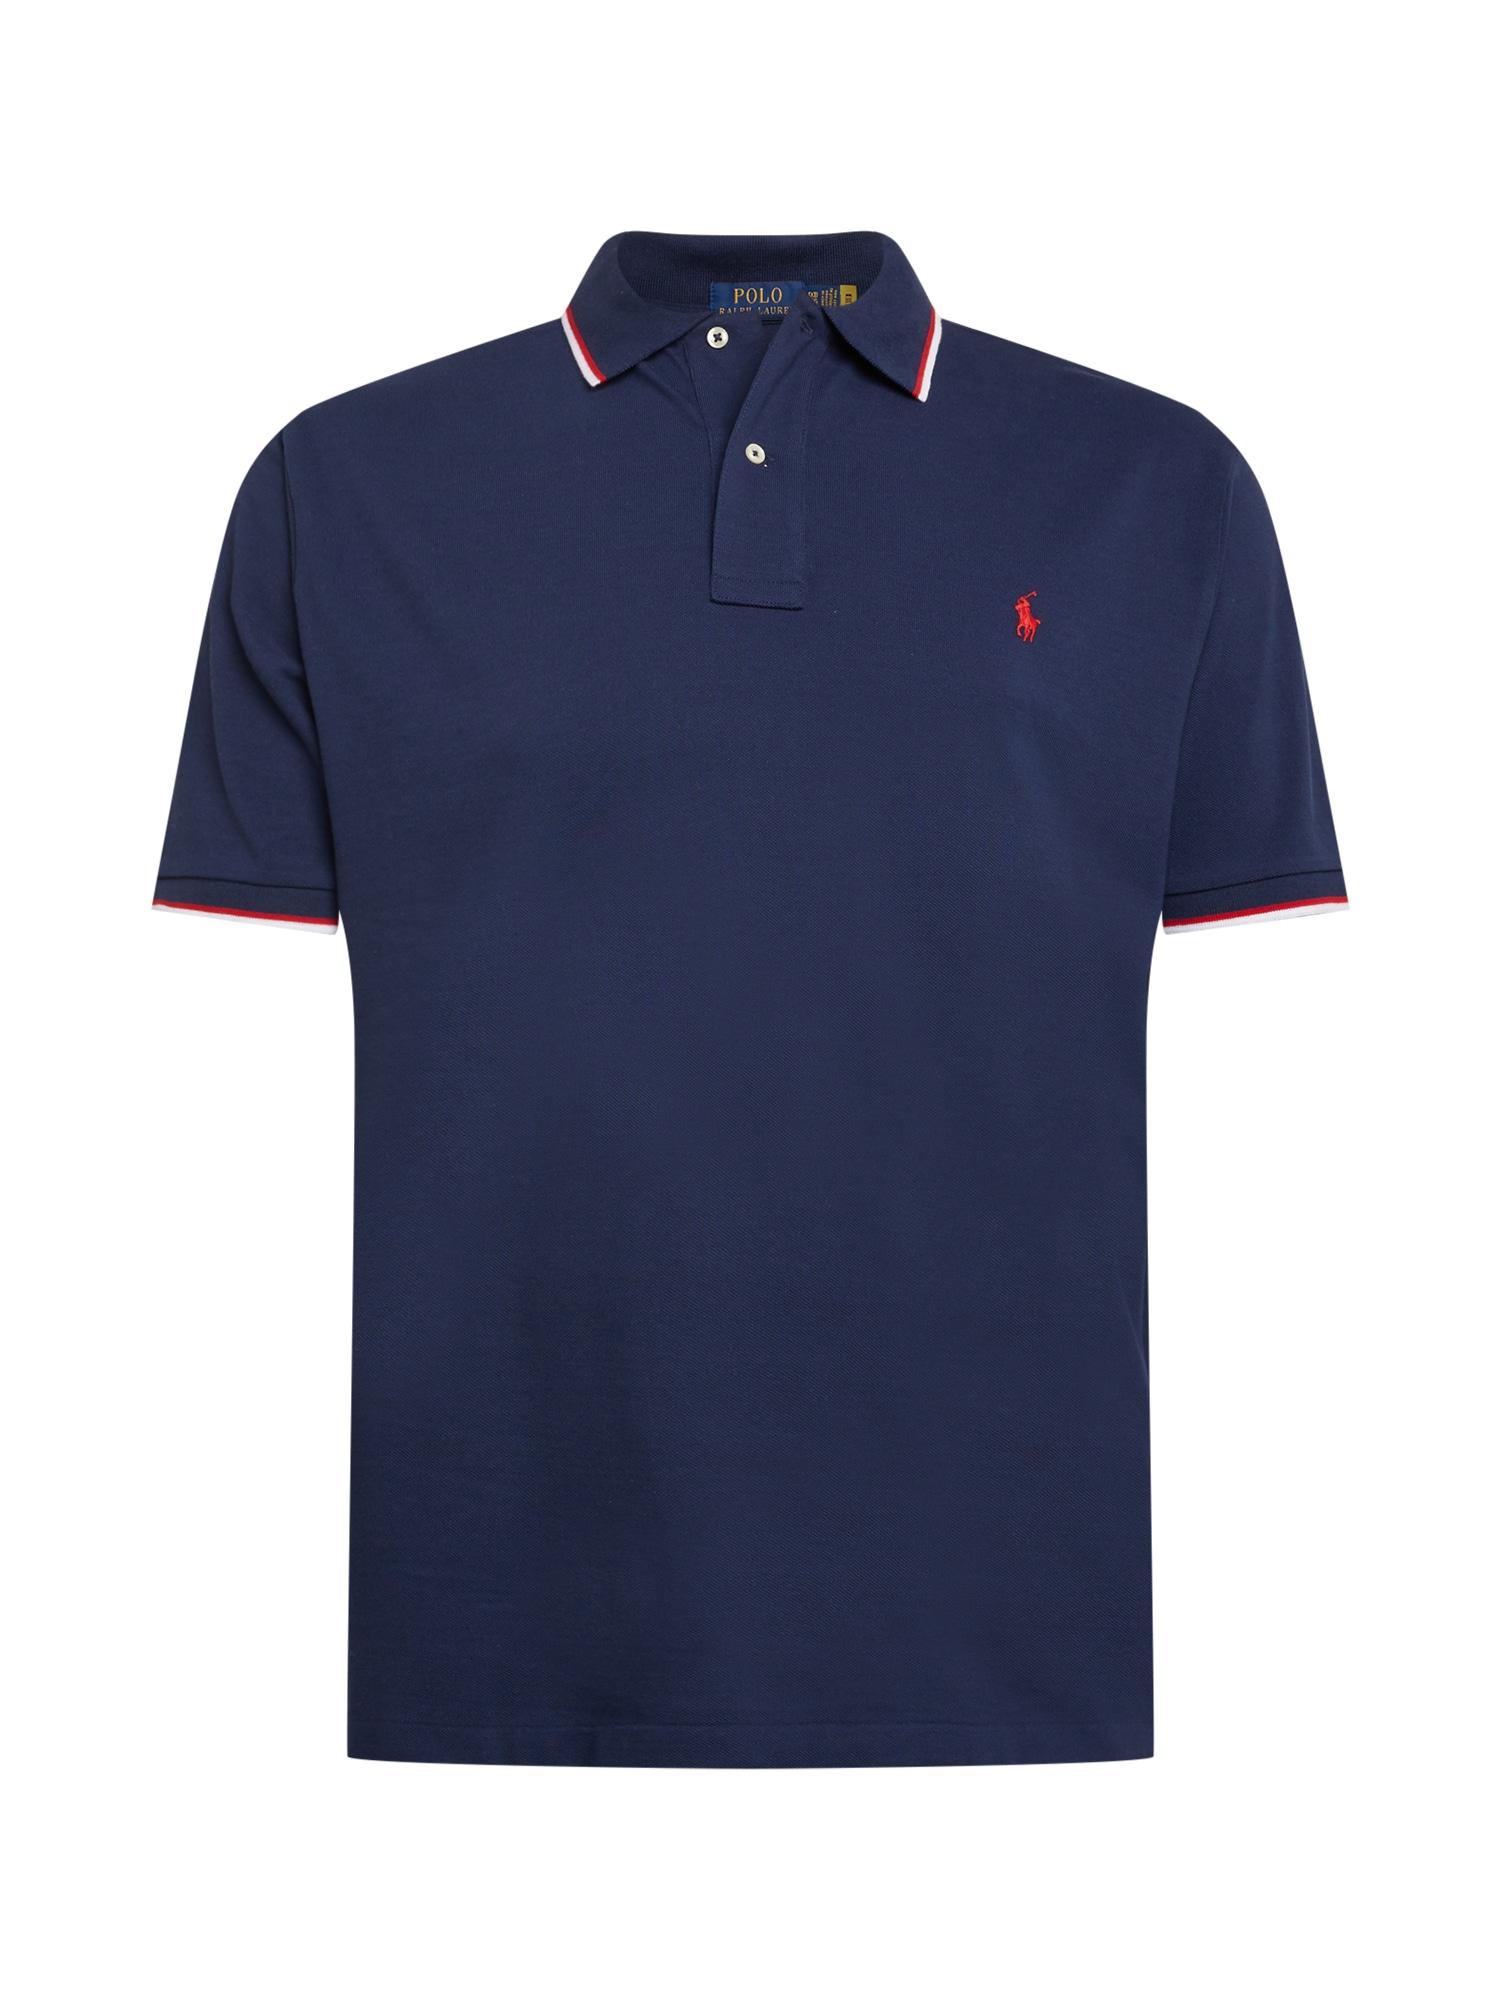 Polo Ralph Lauren Big & Tall Marškinėliai tamsiai mėlyna / balta / raudona